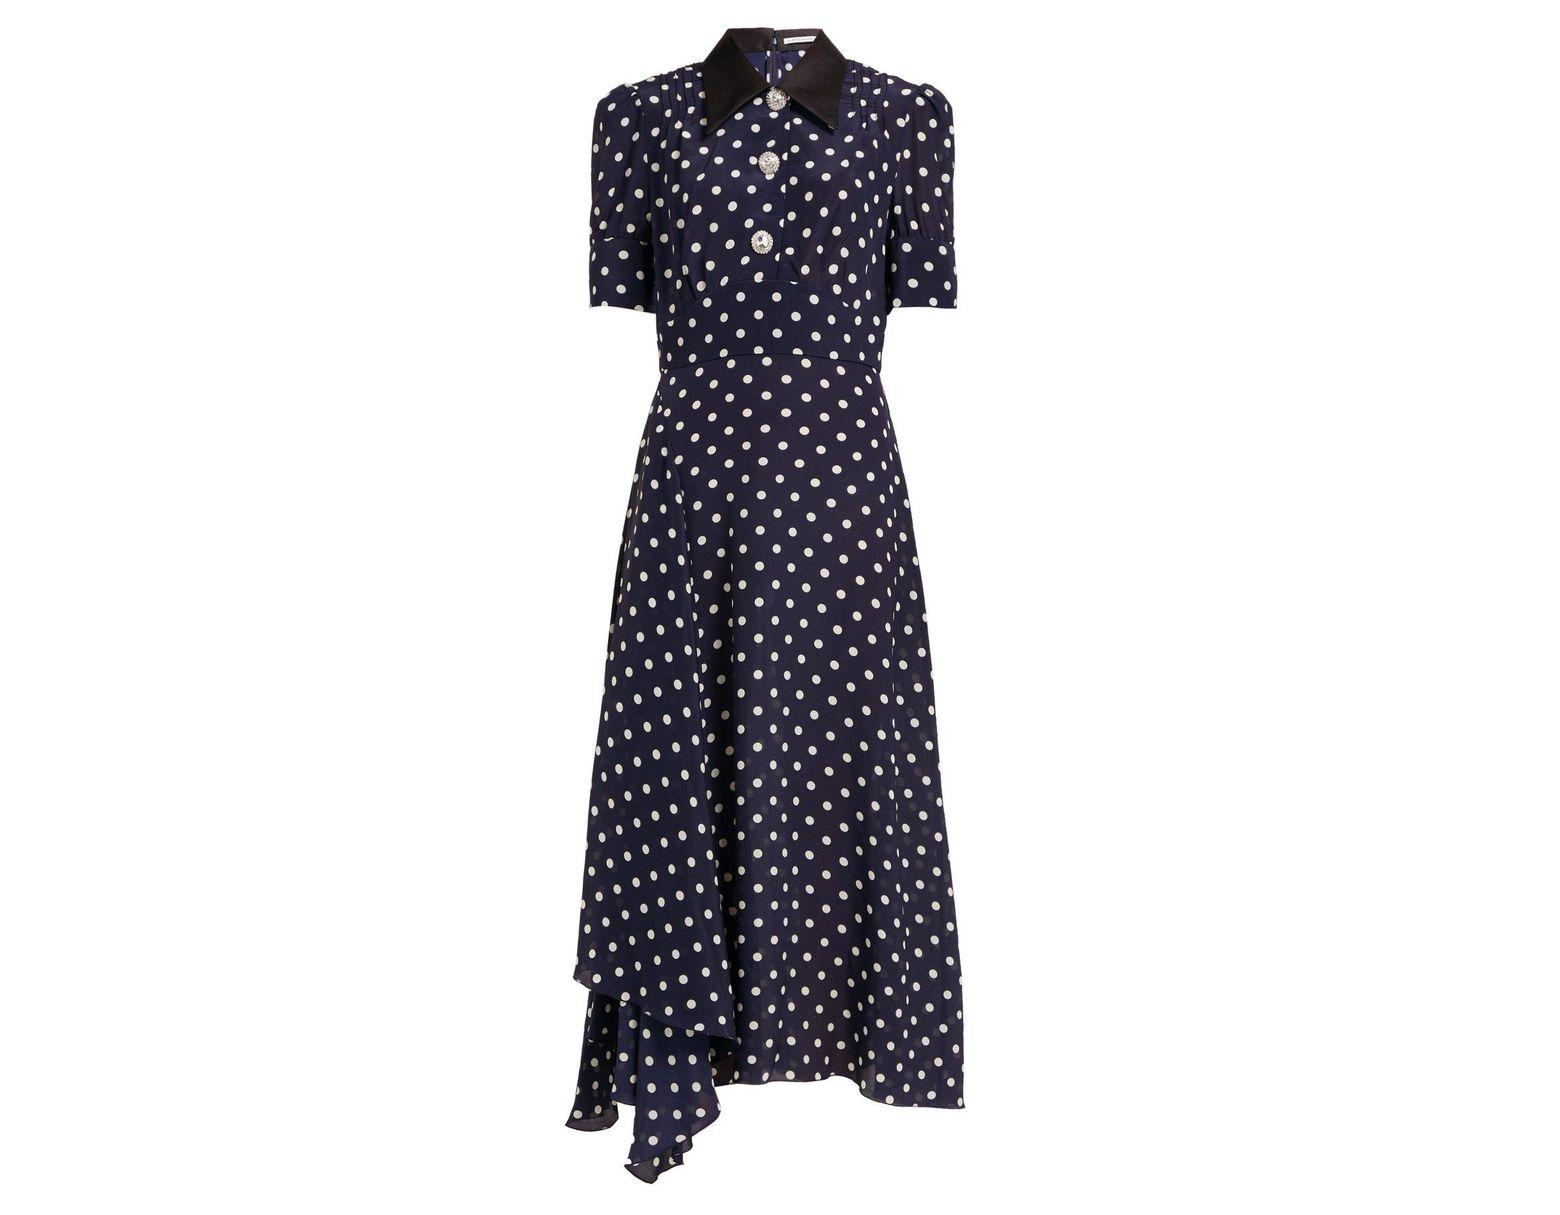 5f0ab9a7365b Alessandra Rich Embellished Polka Dot Dress in Blue - Save 51% - Lyst